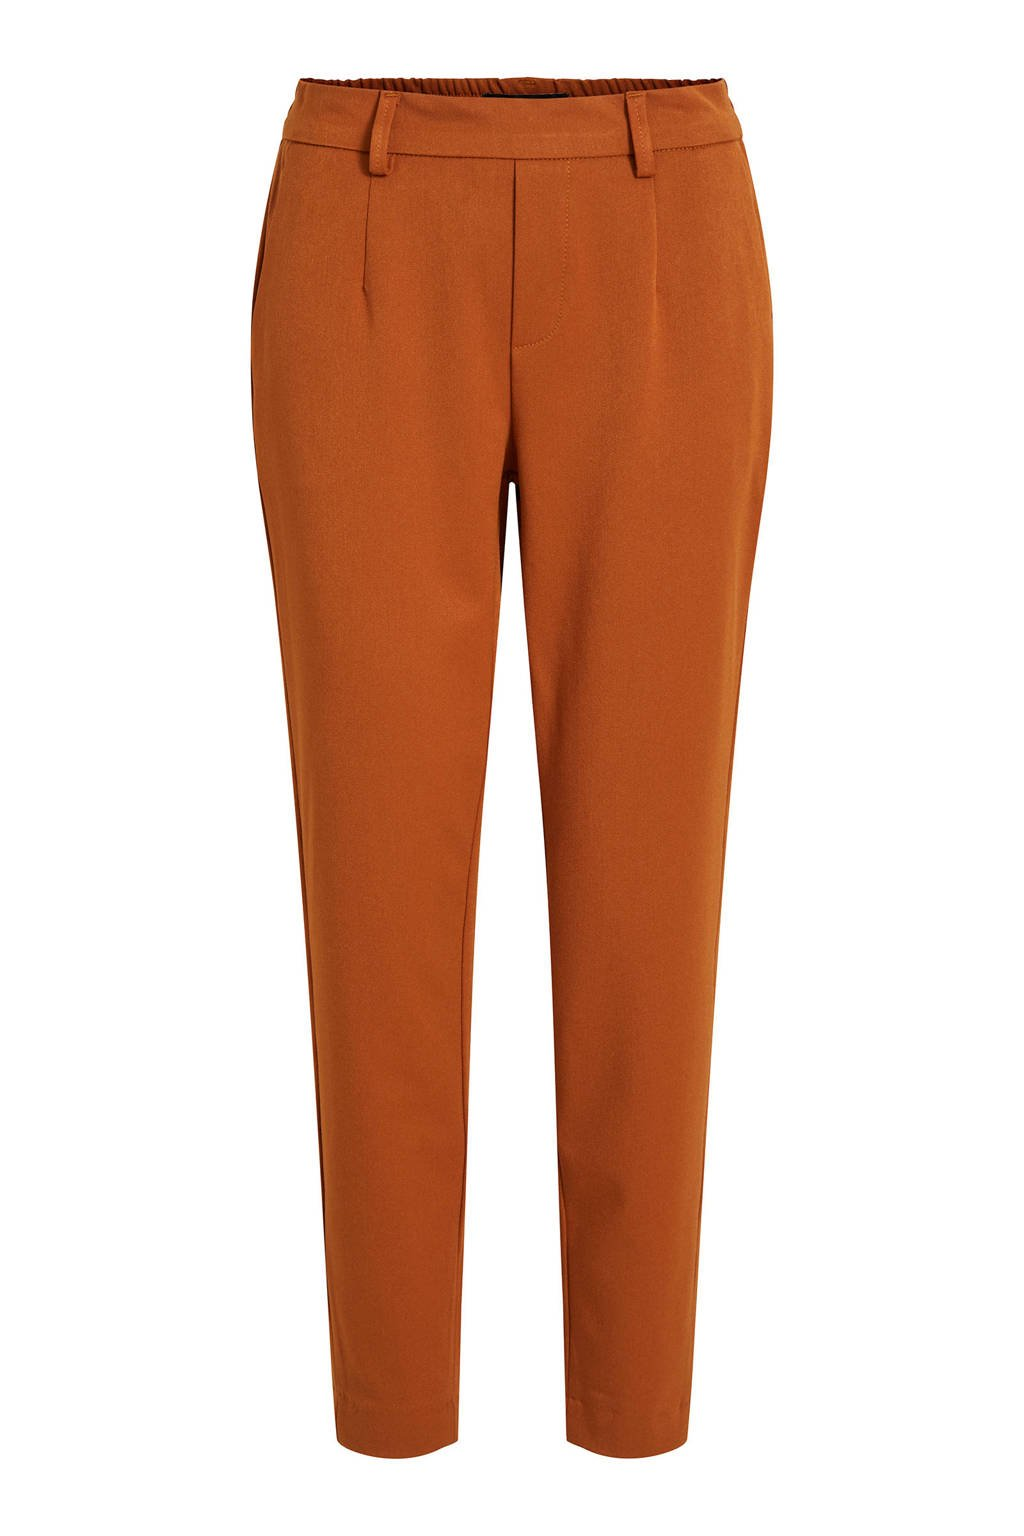 OBJECT regular fit pantalon roestbruin, Roestbruin